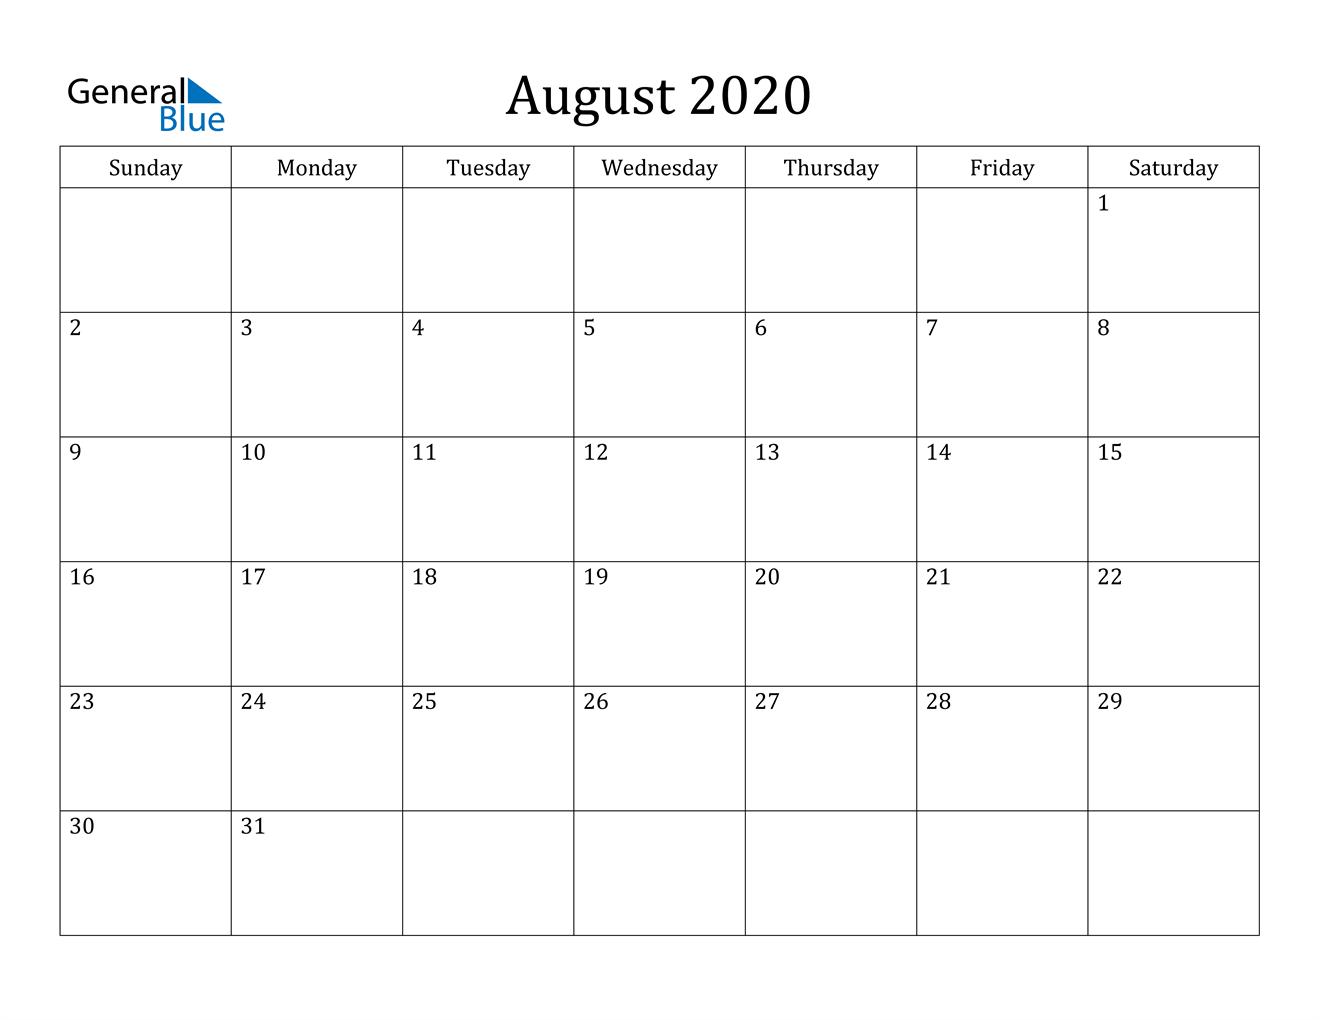 Image of August 2020 Classic Professional Calendar Calendar